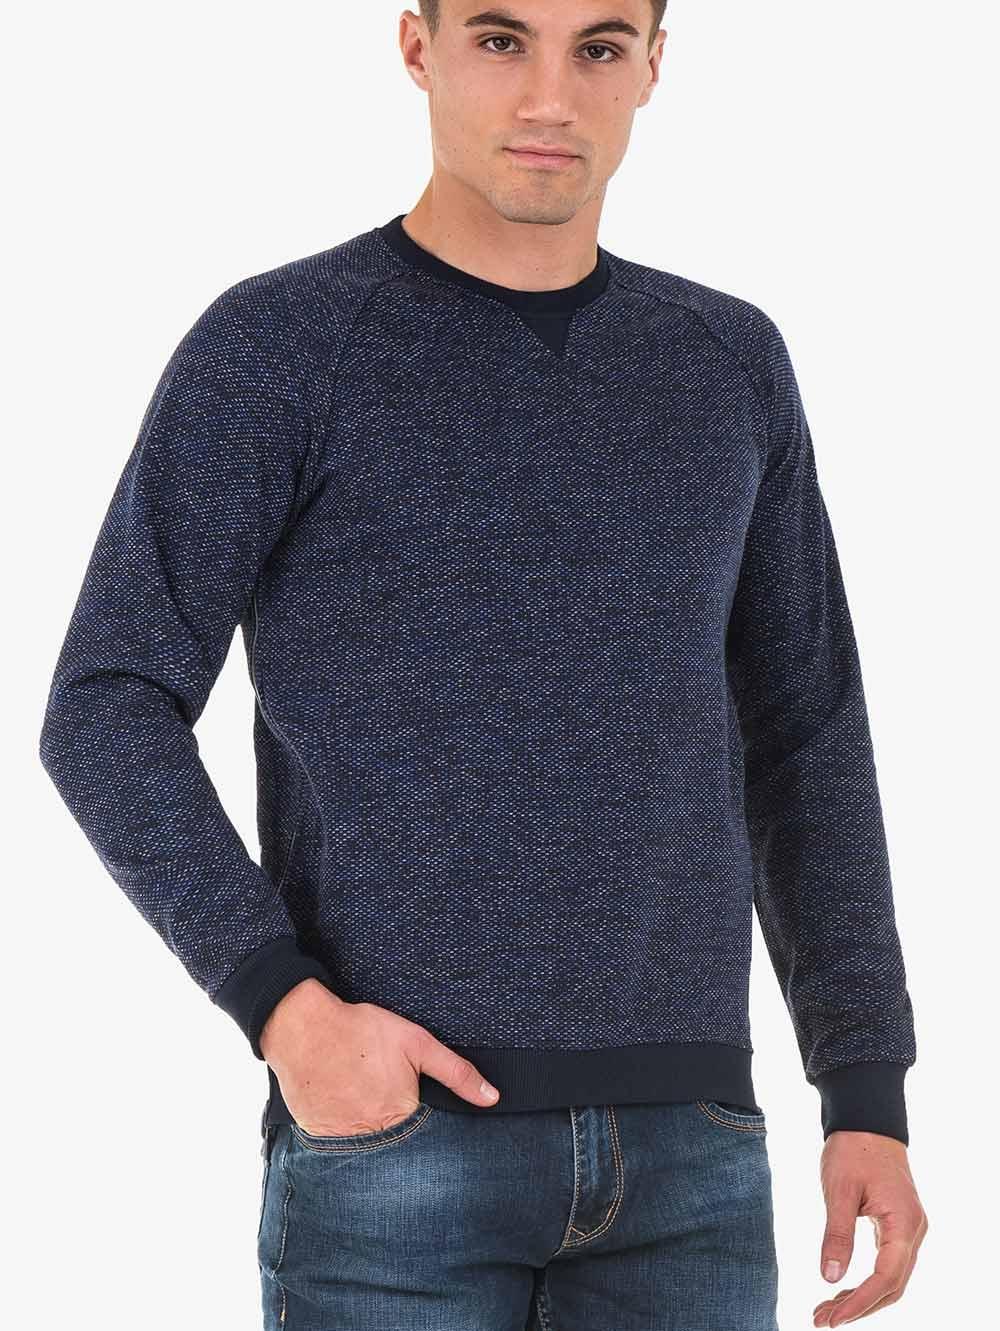 cb35386819e Мъжки пуловер MCL - тъмно син   Пуловери от INDIGO Fashion